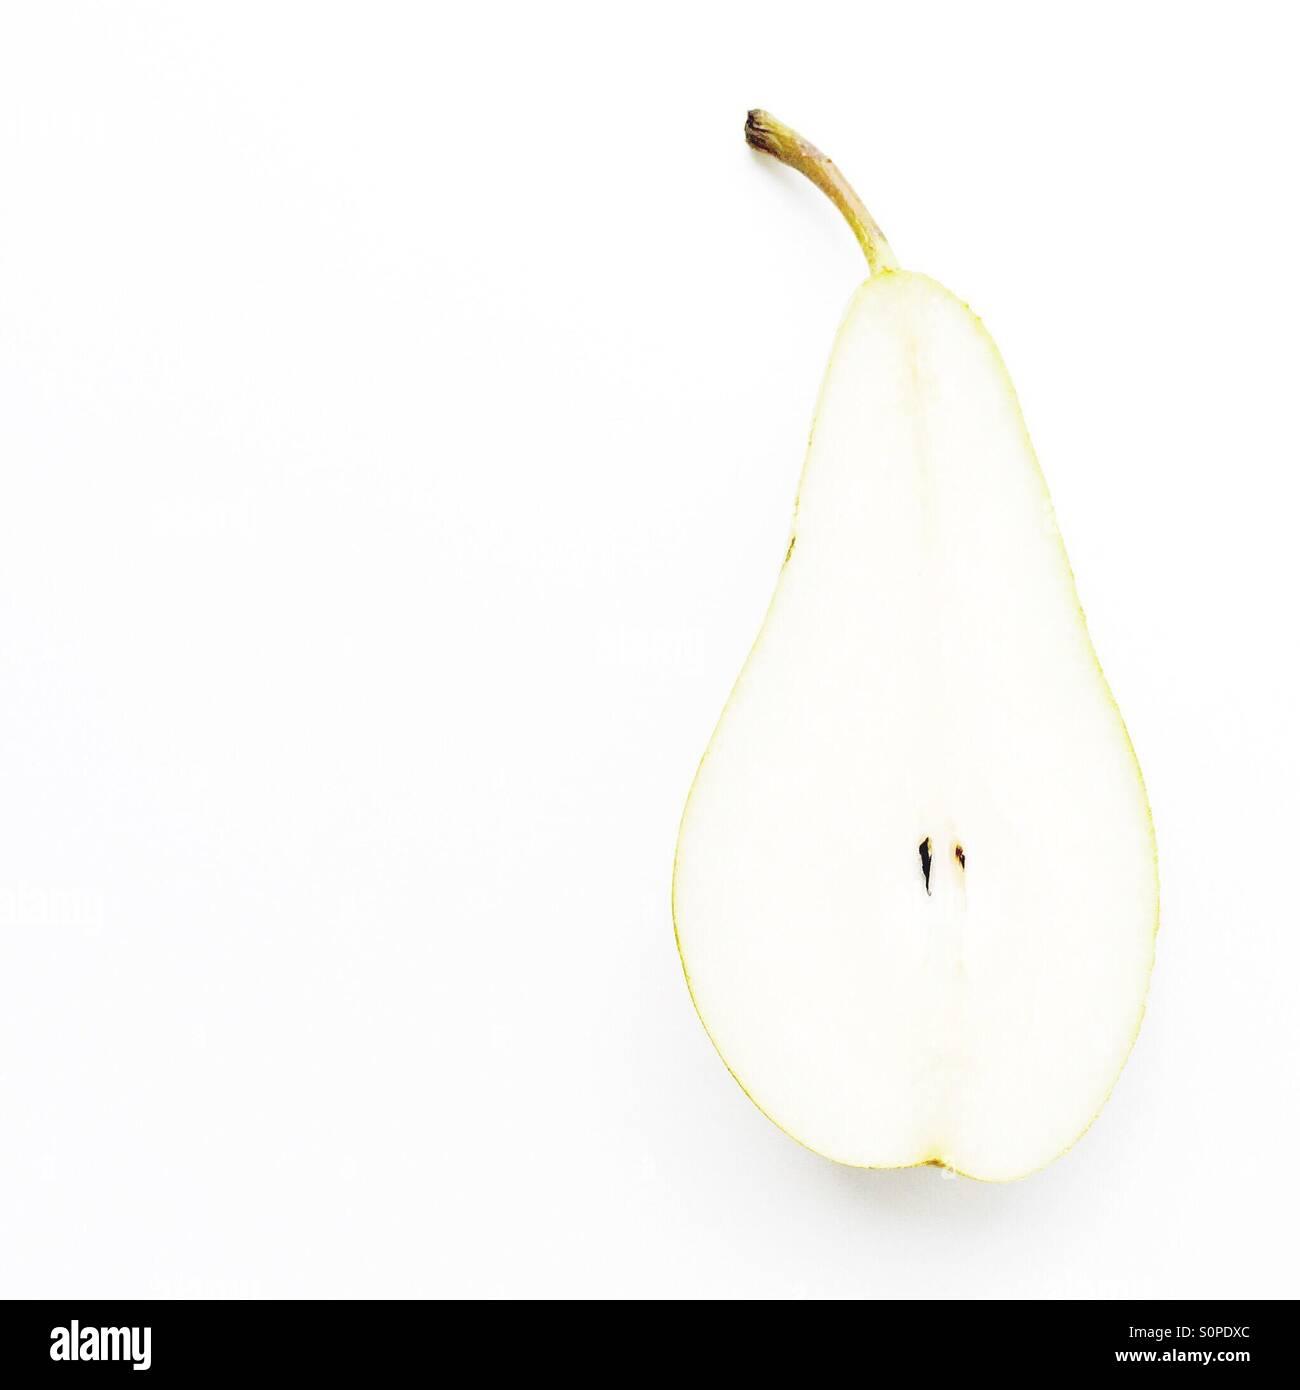 Imagen minimalista de una pera cortada a la mitad Foto de stock